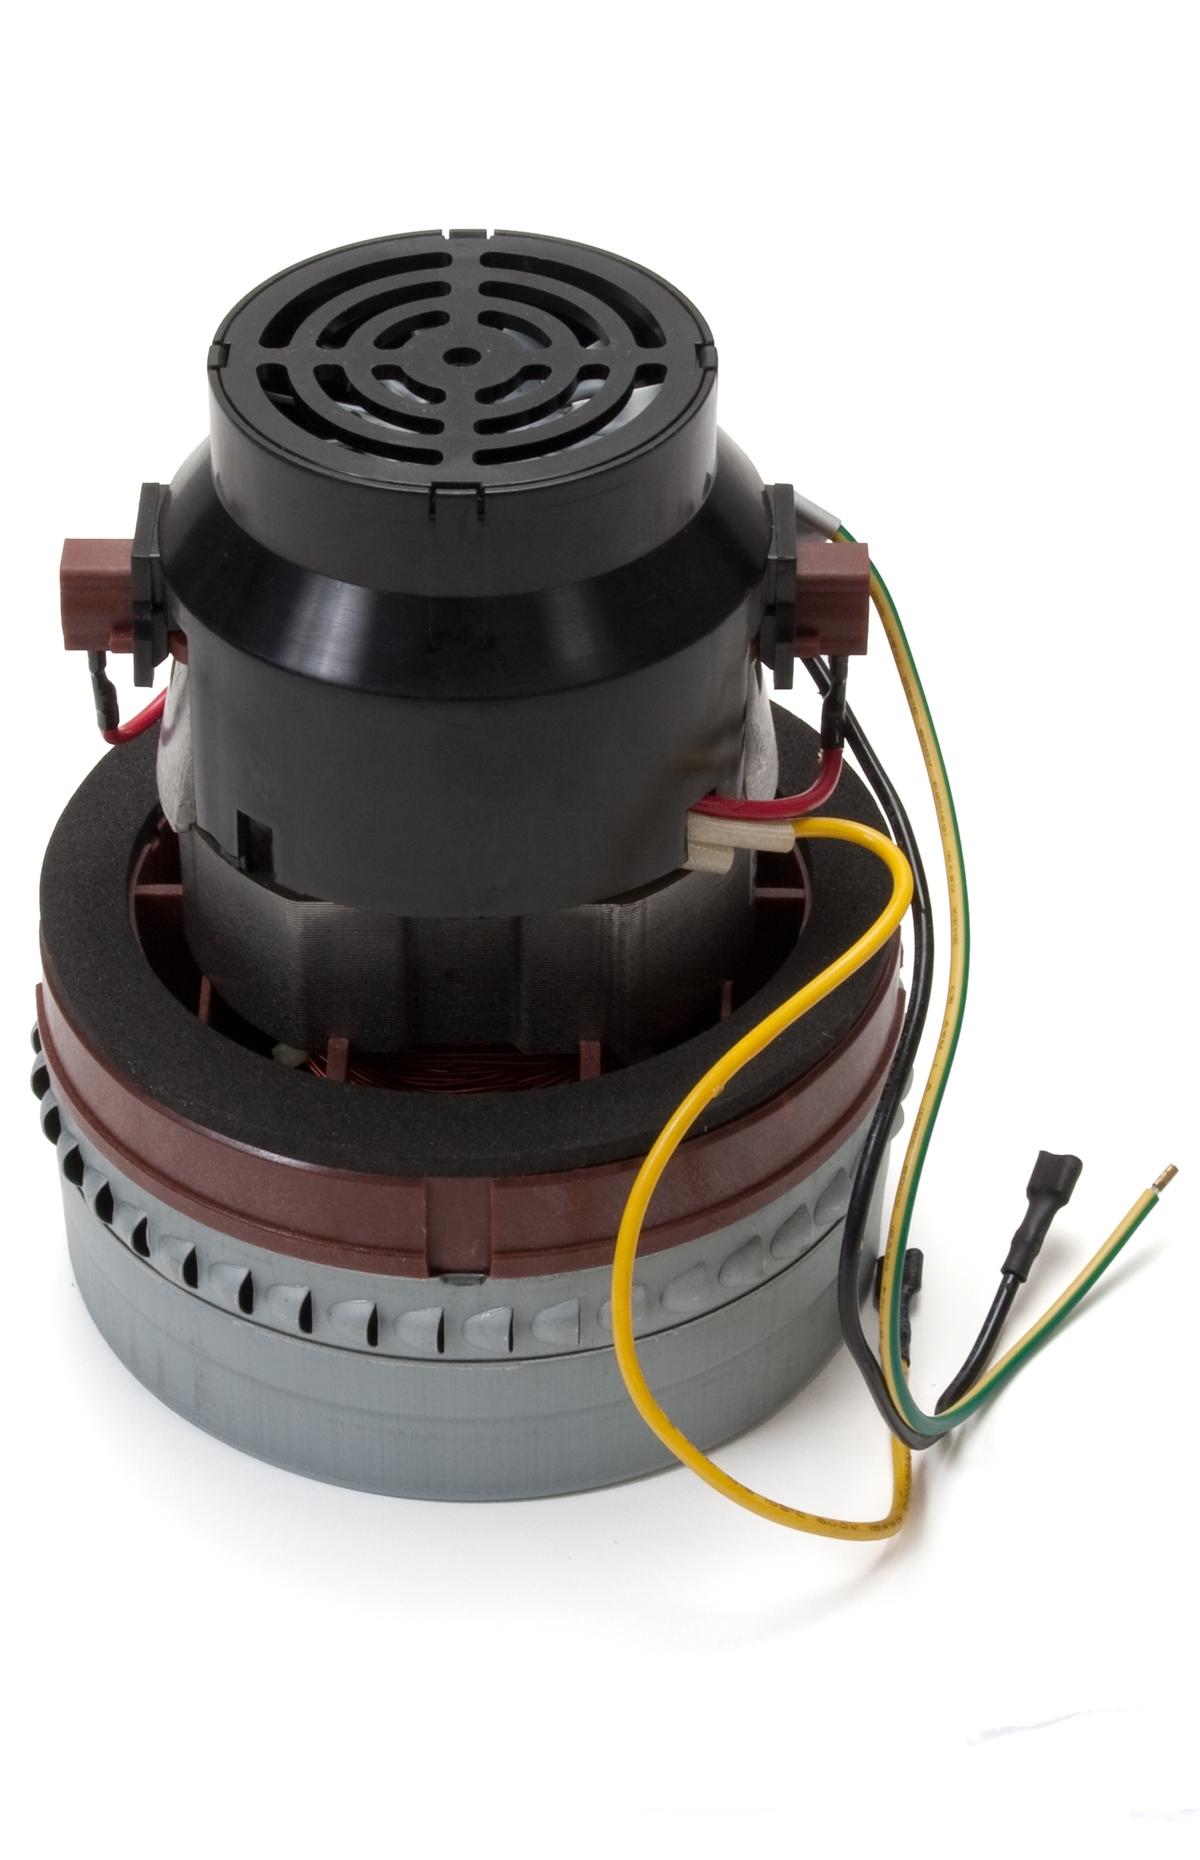 Motor Wet/Dry Vacuums, PF51, PF53, PF55, PF56, PF57 and PF58